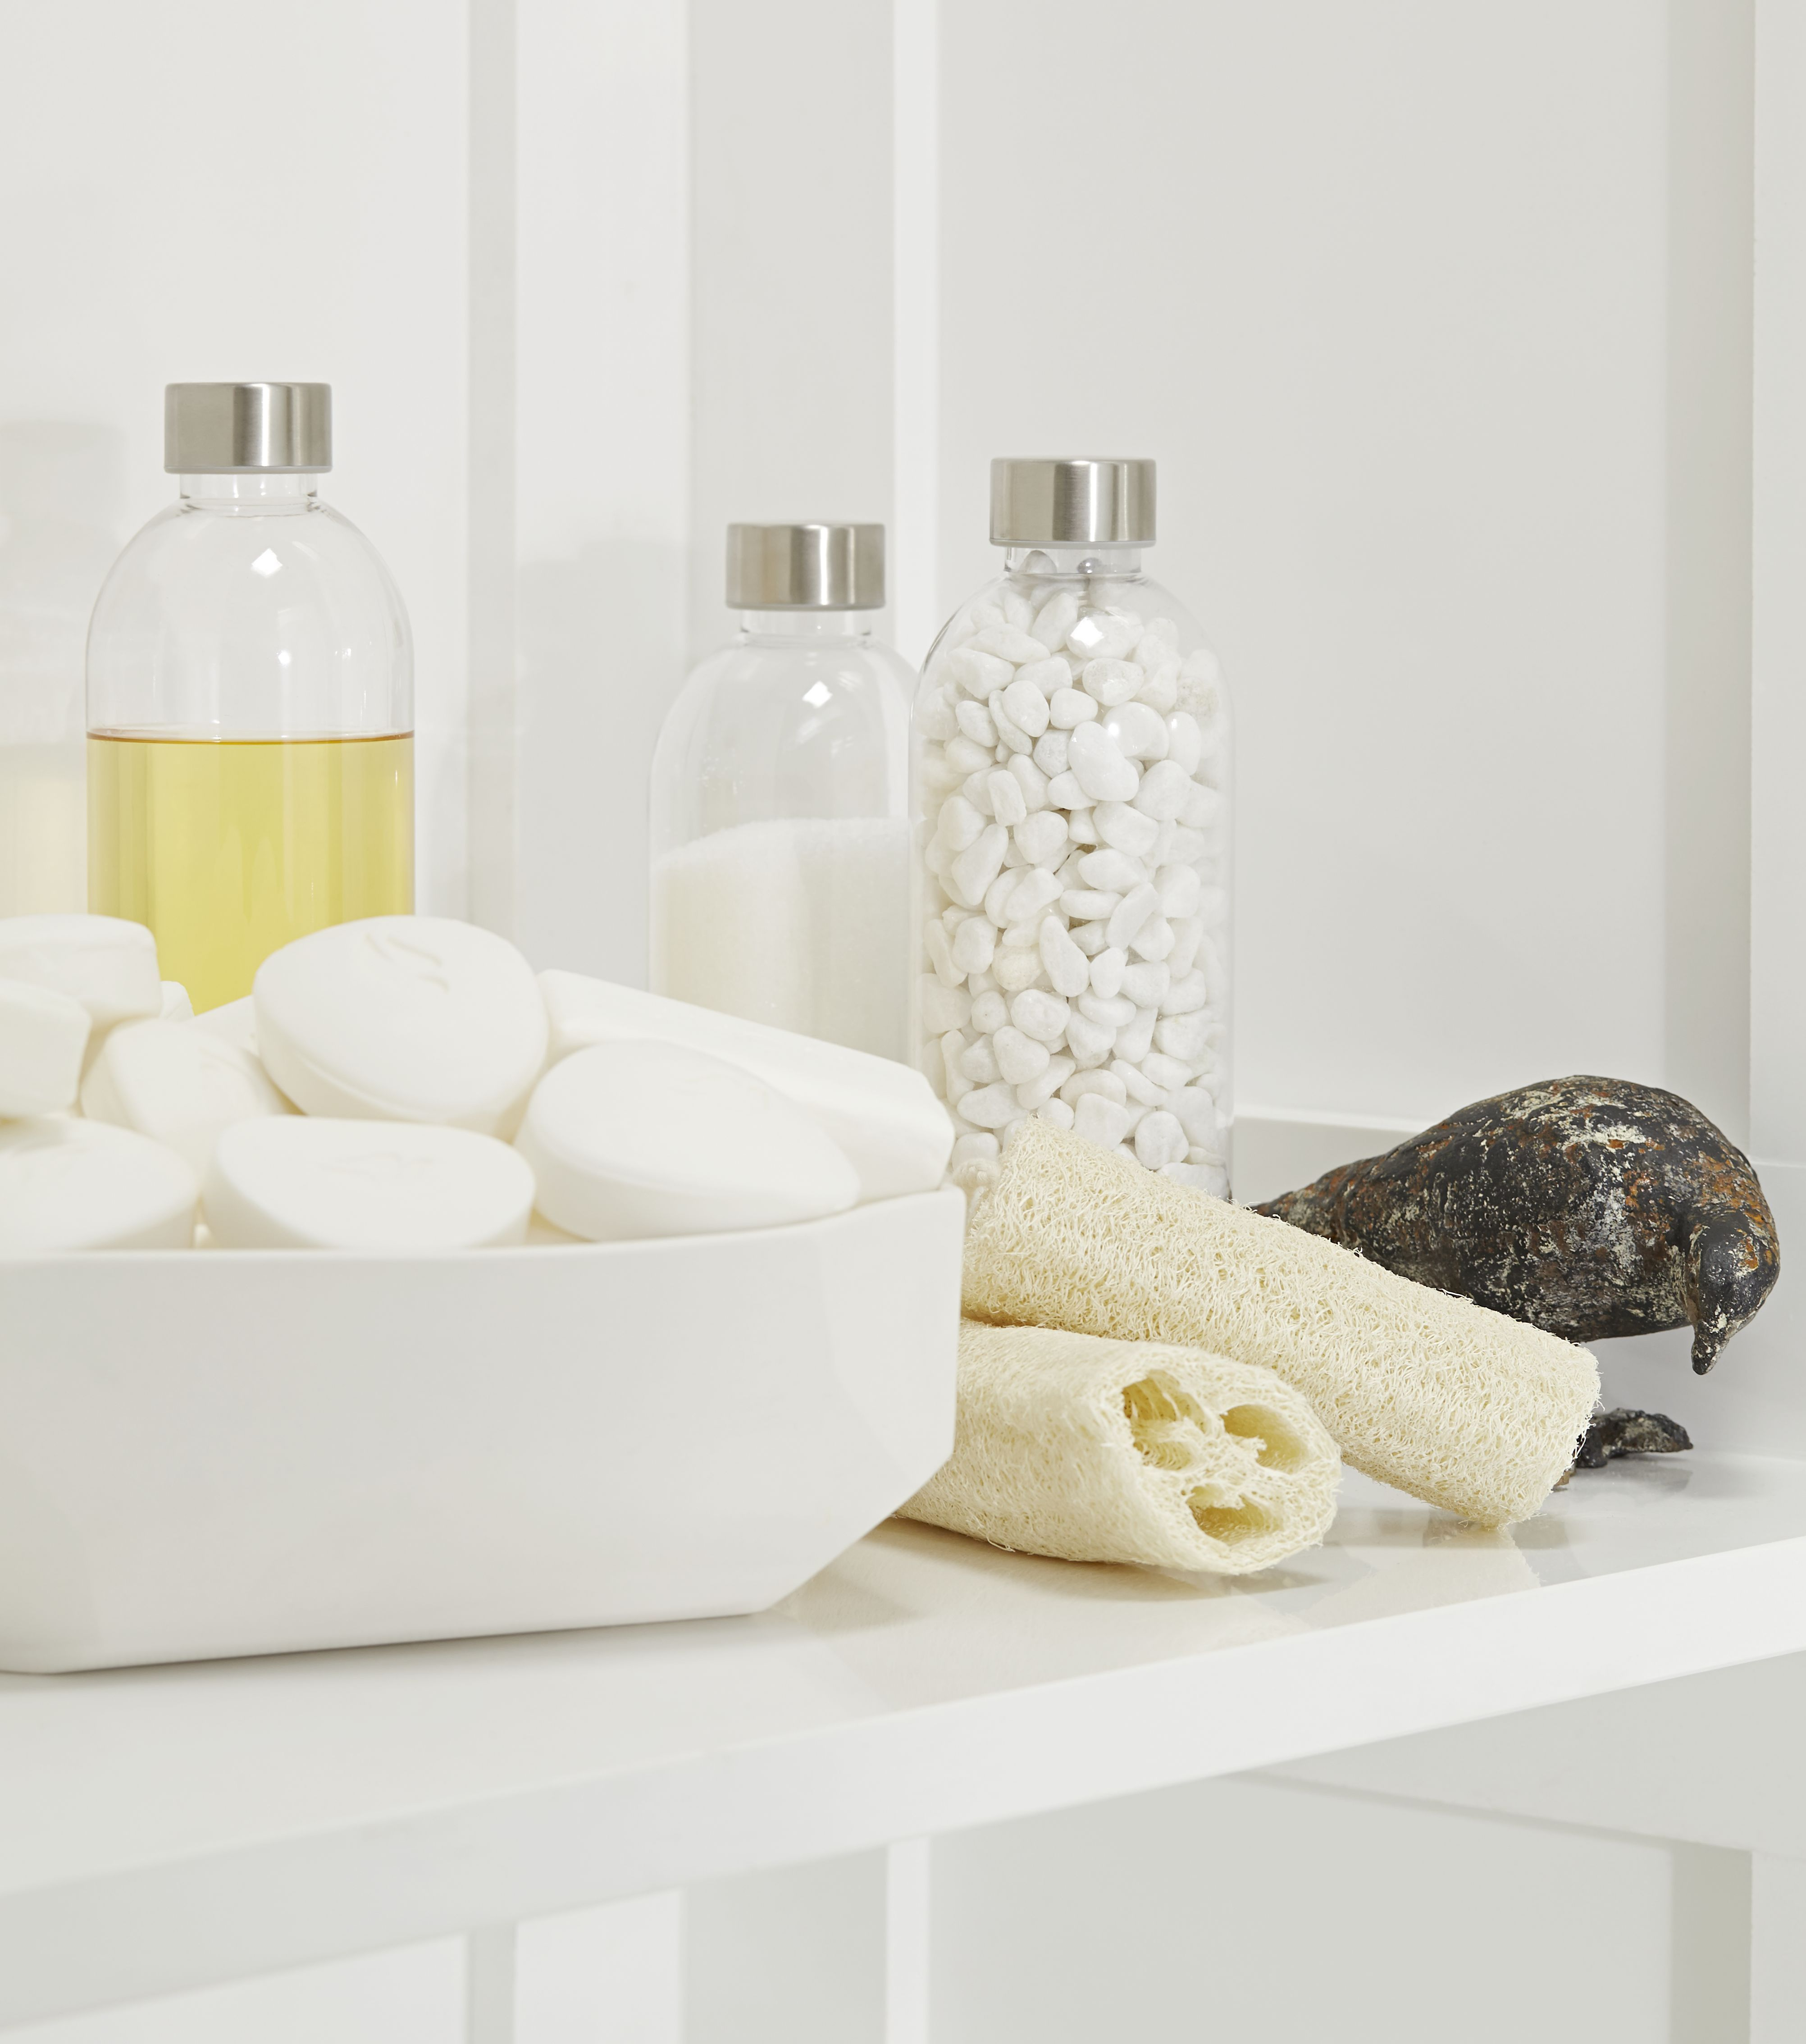 HanStone Royal Blanc Vanity in Powder Room